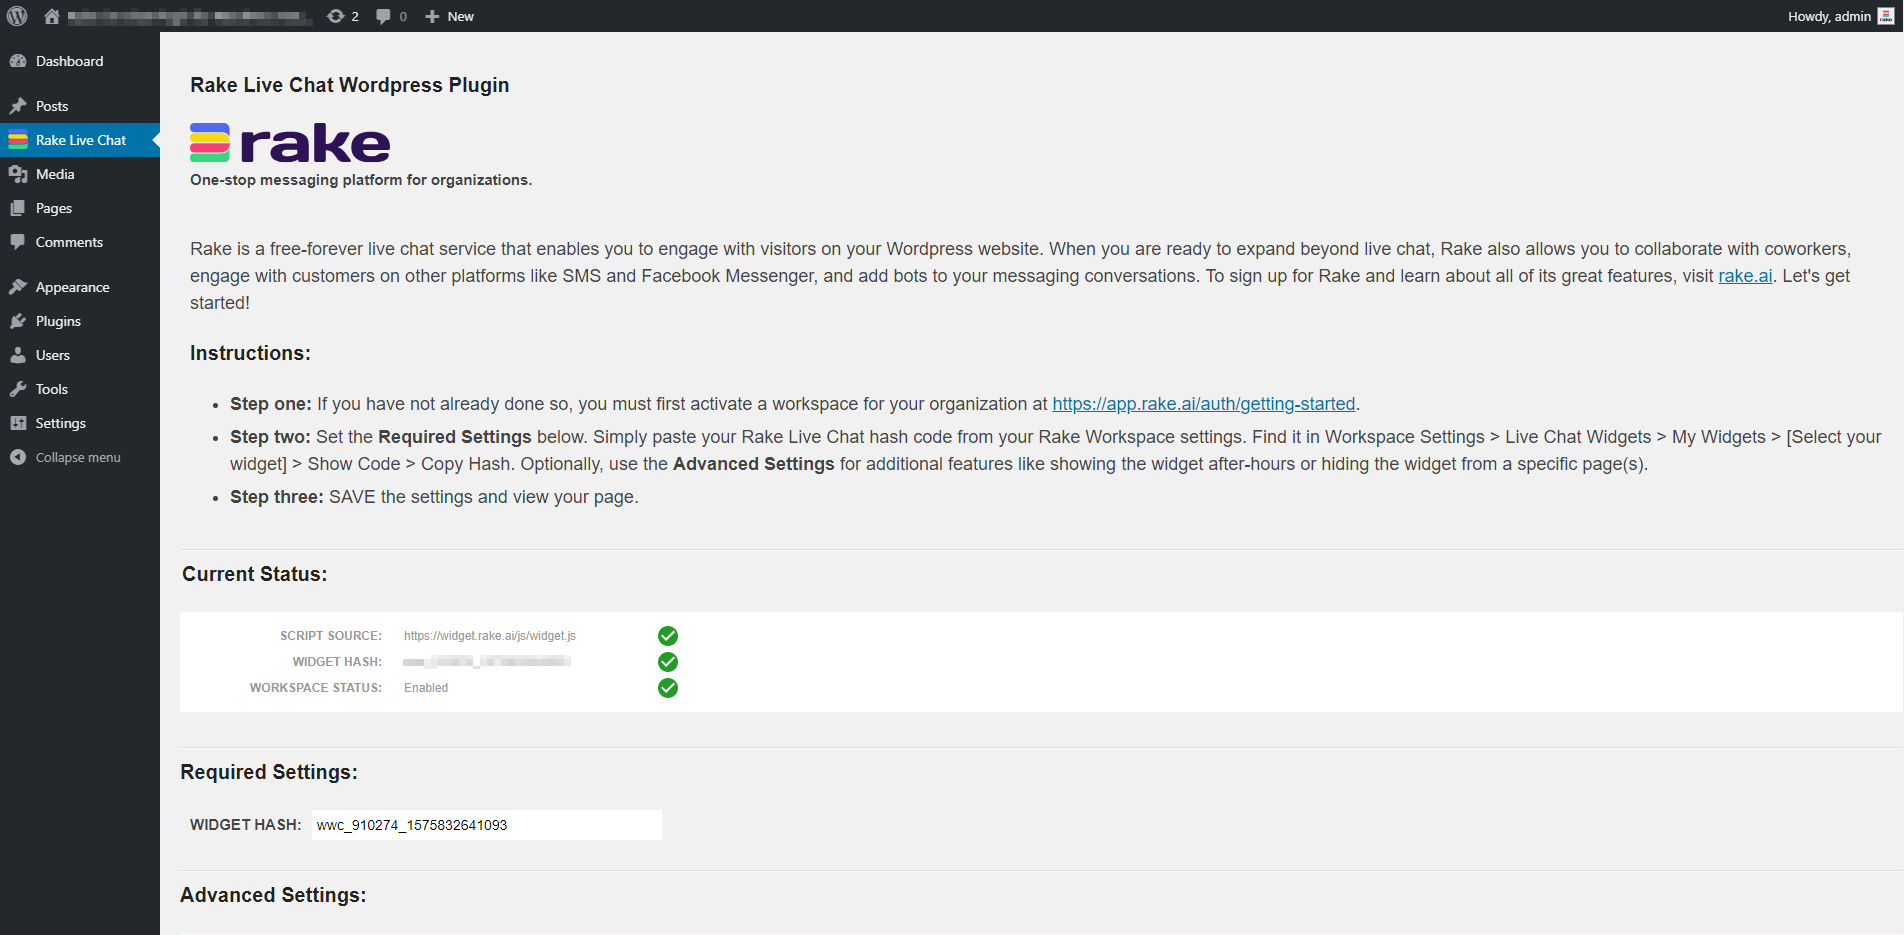 Wordpress plugin screenshot image